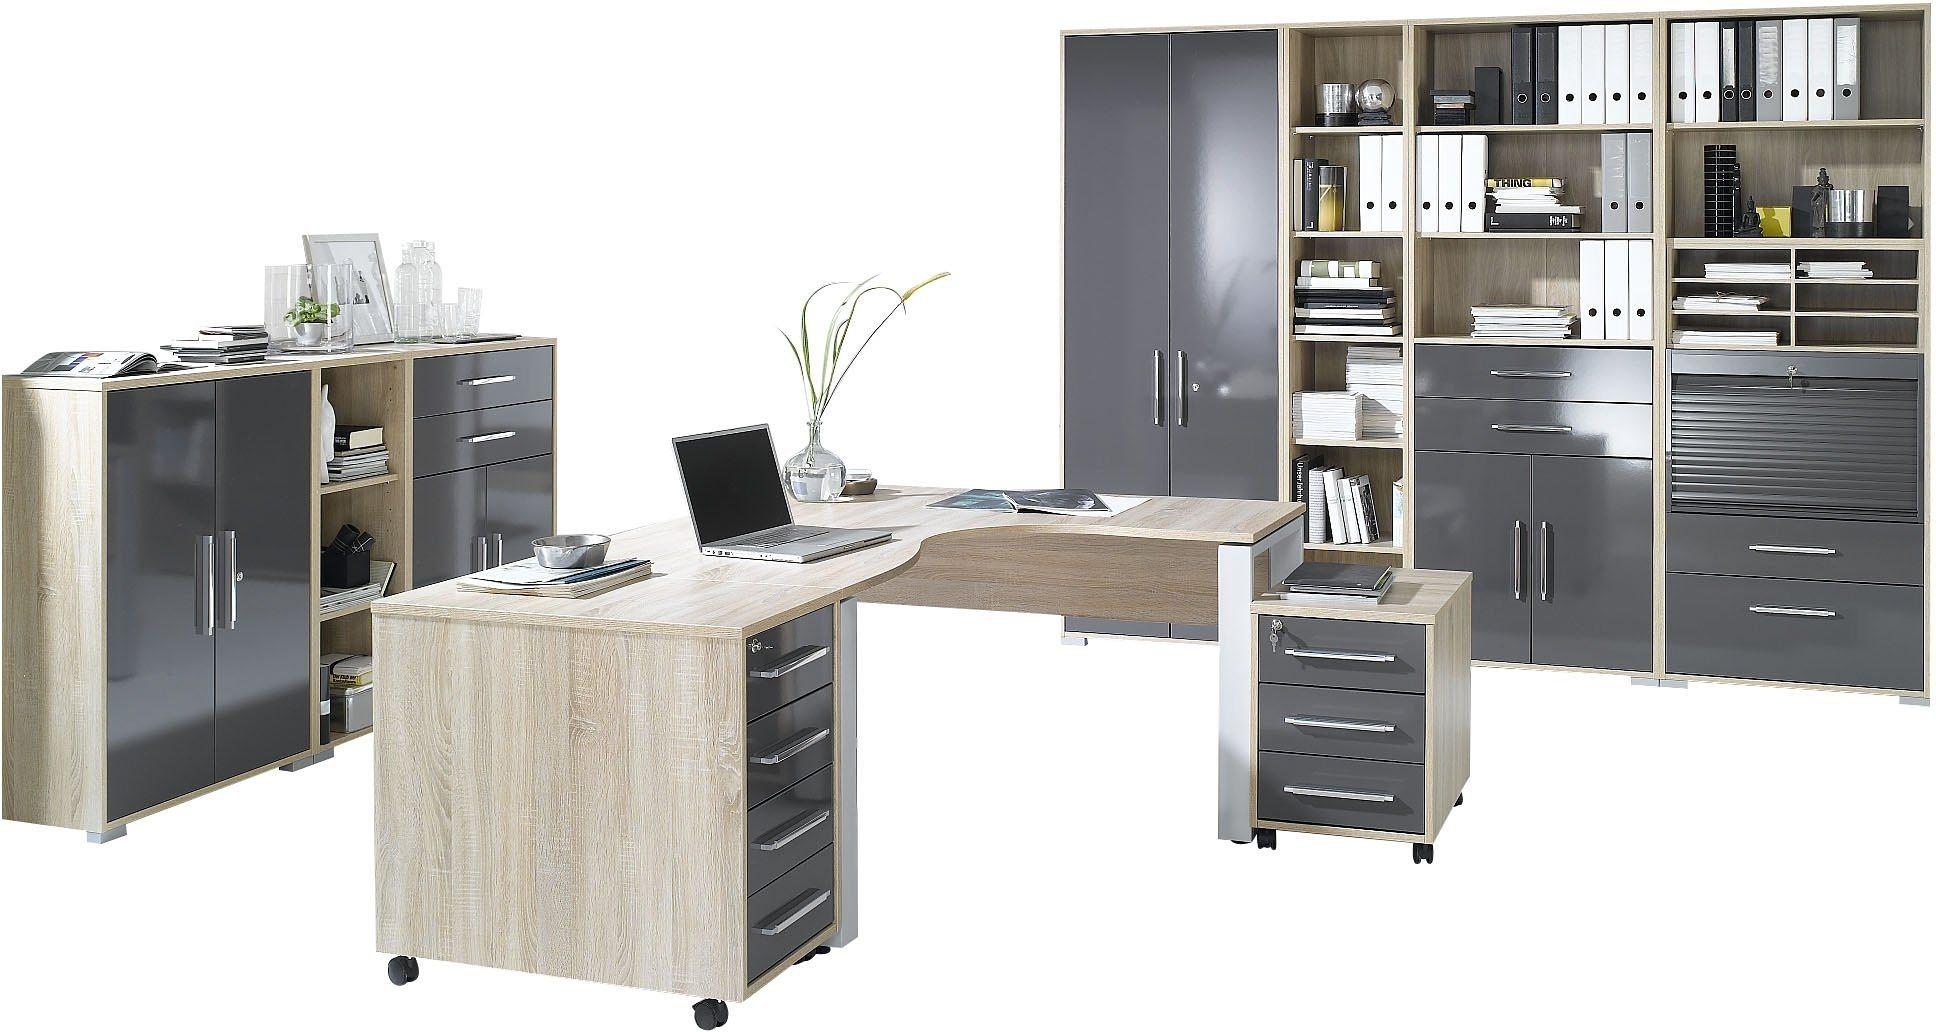 Maja Möbel Büromöbel-Set (10-tlg.) »1203« | Büro > Büromöbel-Serien | Grau - Hochglanz - Weiß | Hochglanz - Glänzend - Kunststoff - Abs | Maja Möbel